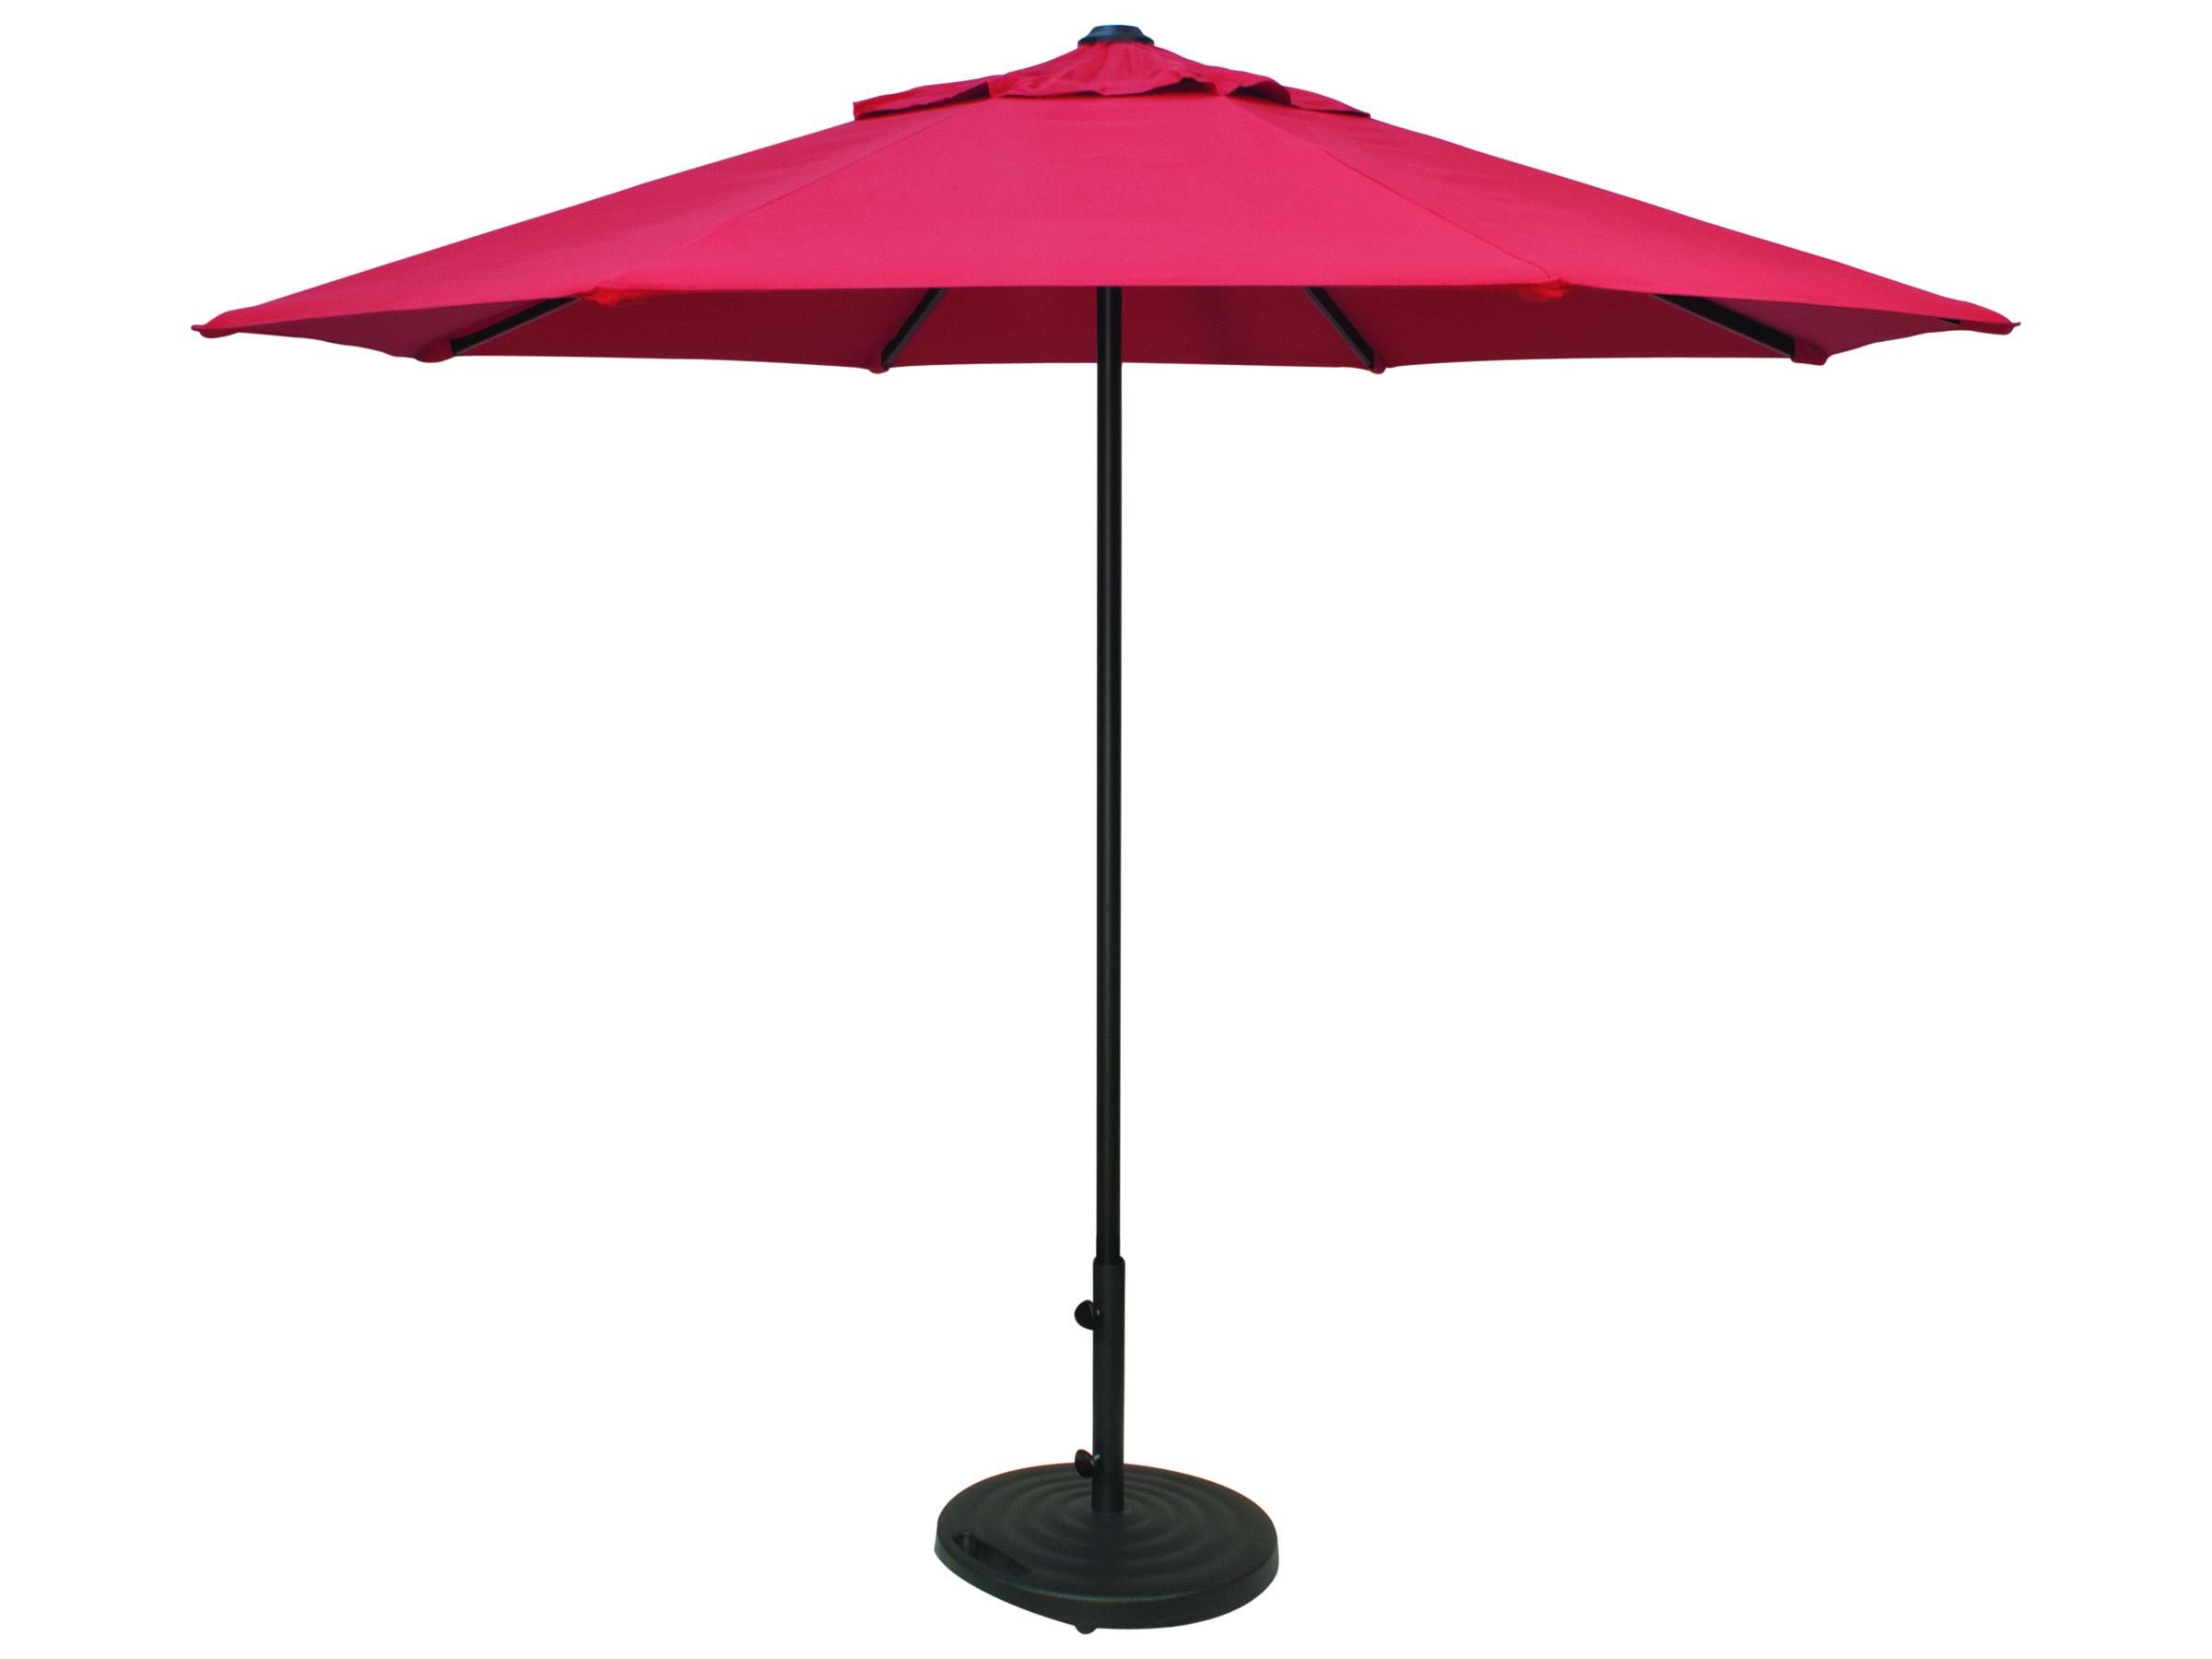 Treasure Garden Commercial Aluminum 9 39 Octagon Push Up Lift Vented Umbrella Ucp409